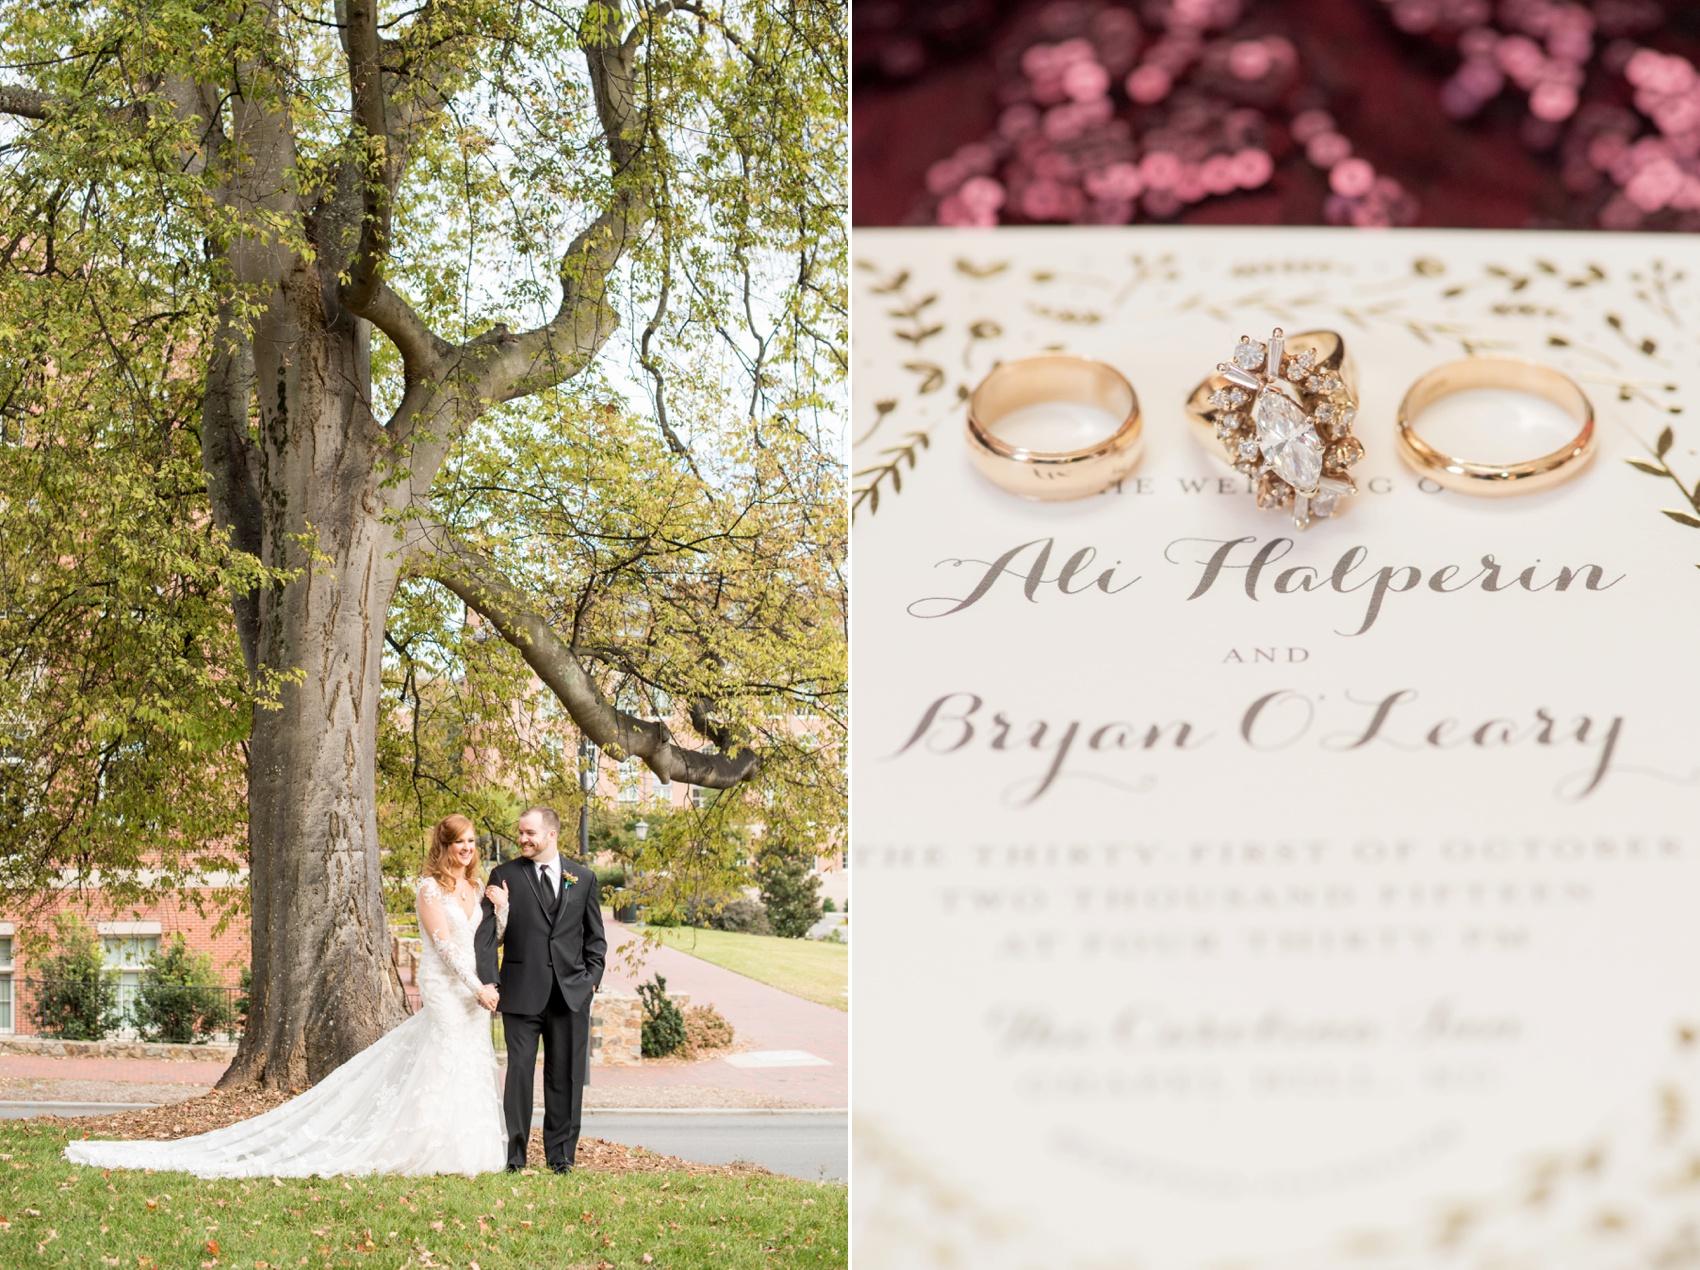 The Carolina Inn Wedding Photos • Ali + Bryan | Raleigh and NYC ...